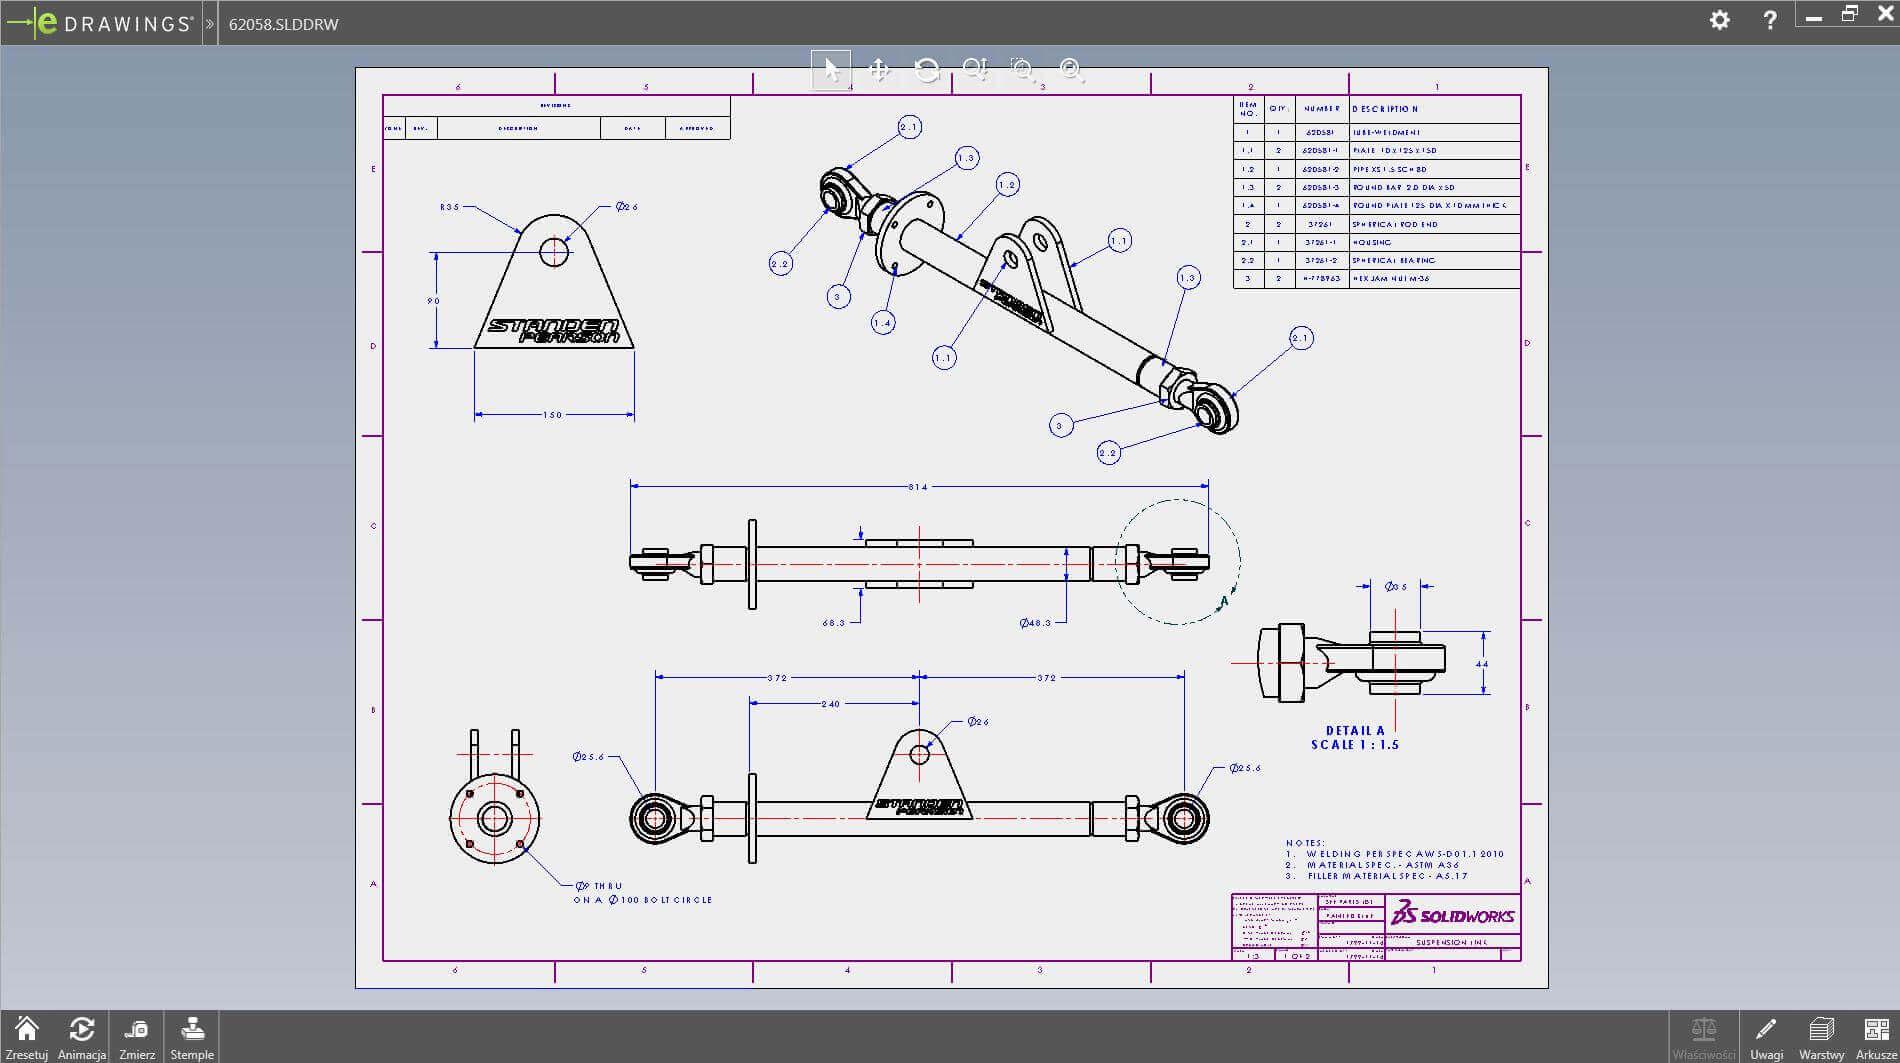 eDrawings - darmowa przeglądarka plików DWG/DXF/STEP 2d/3d CAD